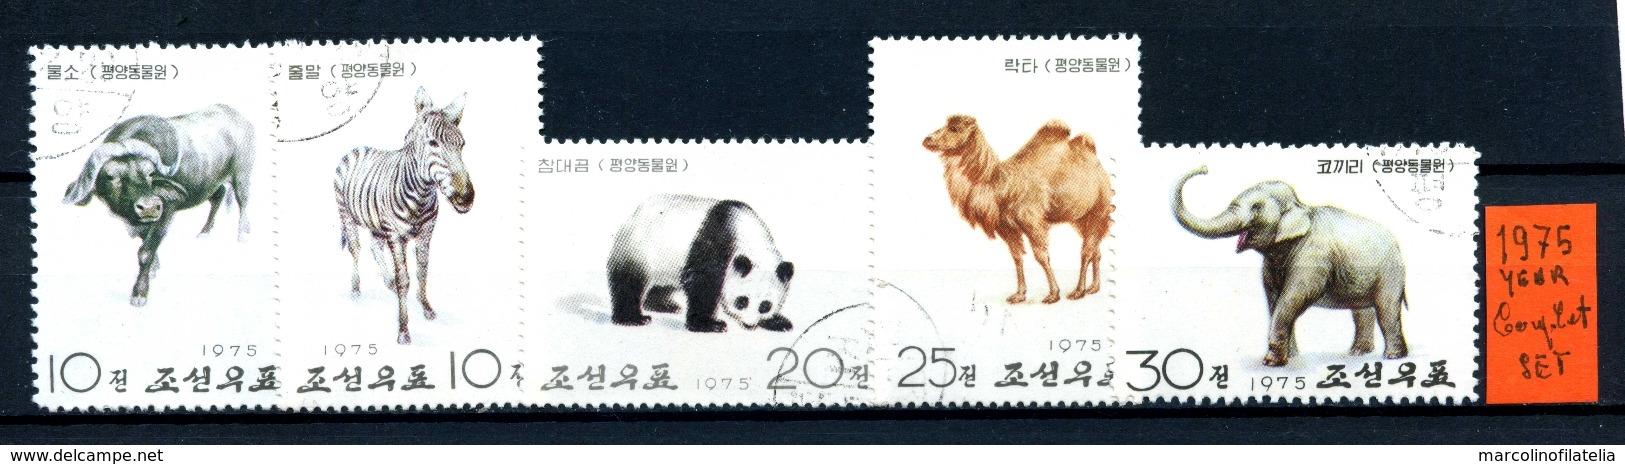 KOREA Del NORD - Year 1975 - COMPLET SET - Animali - Timbrati - Stamped. - Corea Del Nord